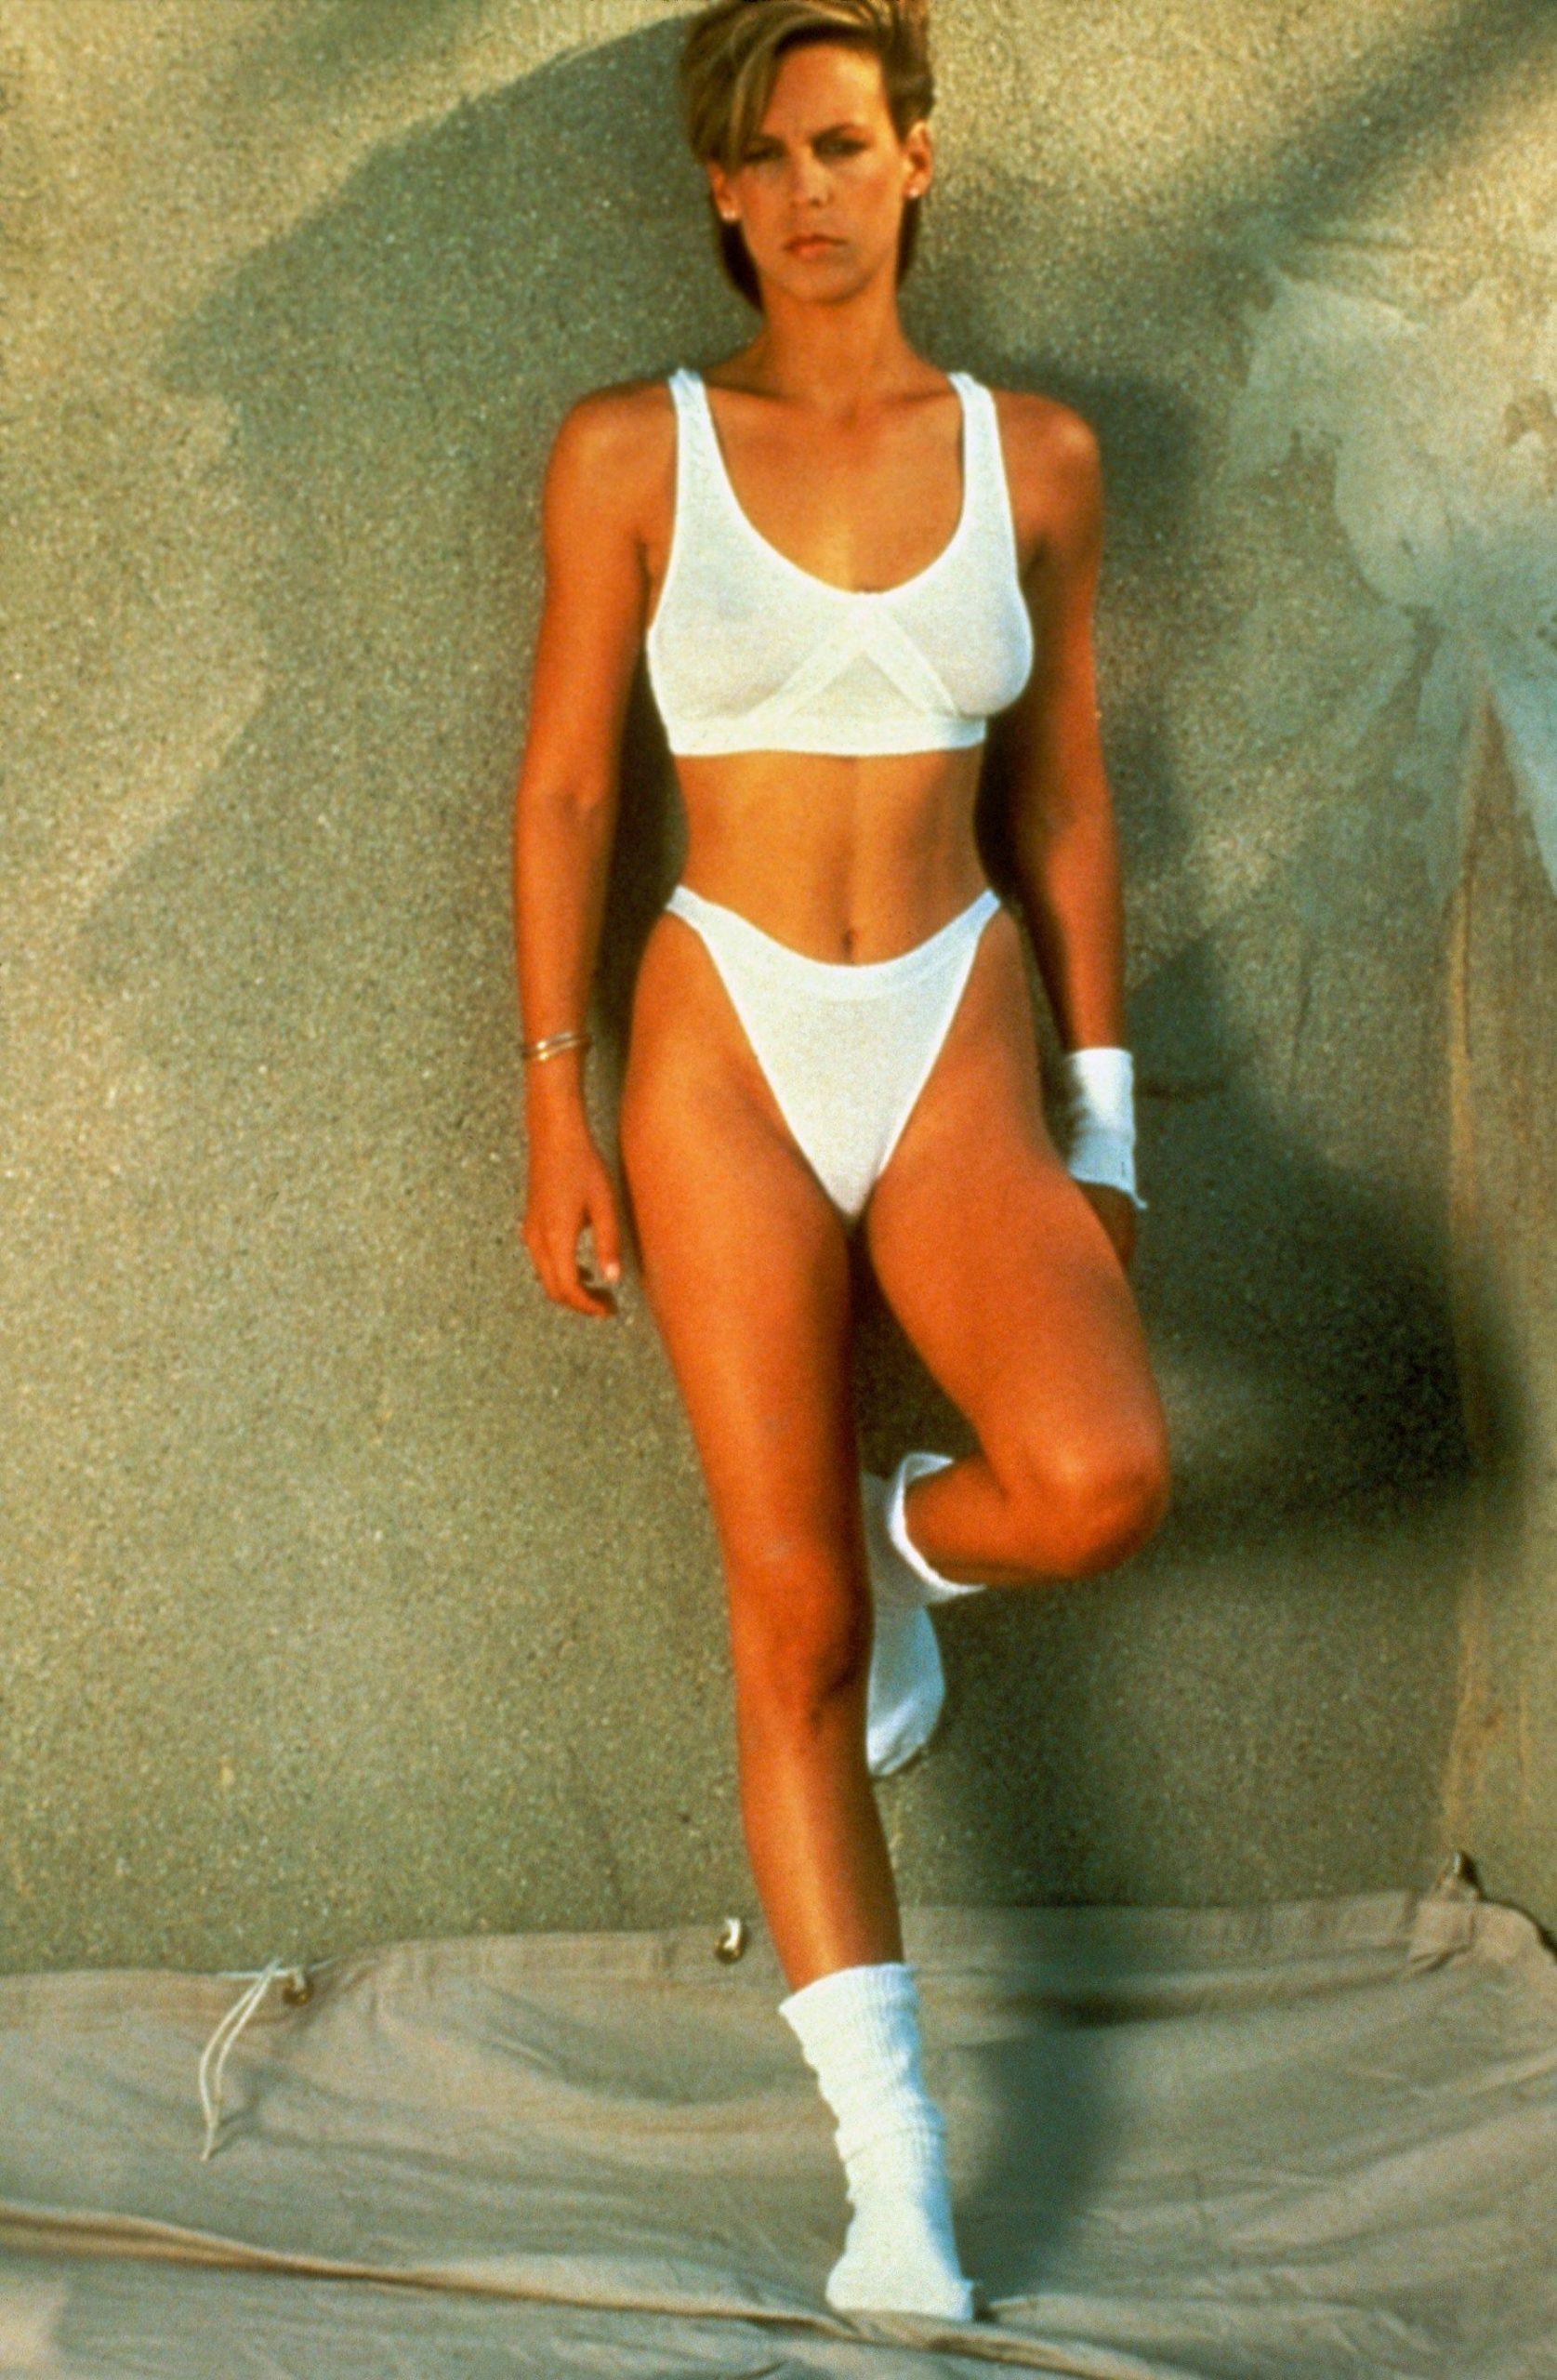 Jamie Lee Curtis bikini pic